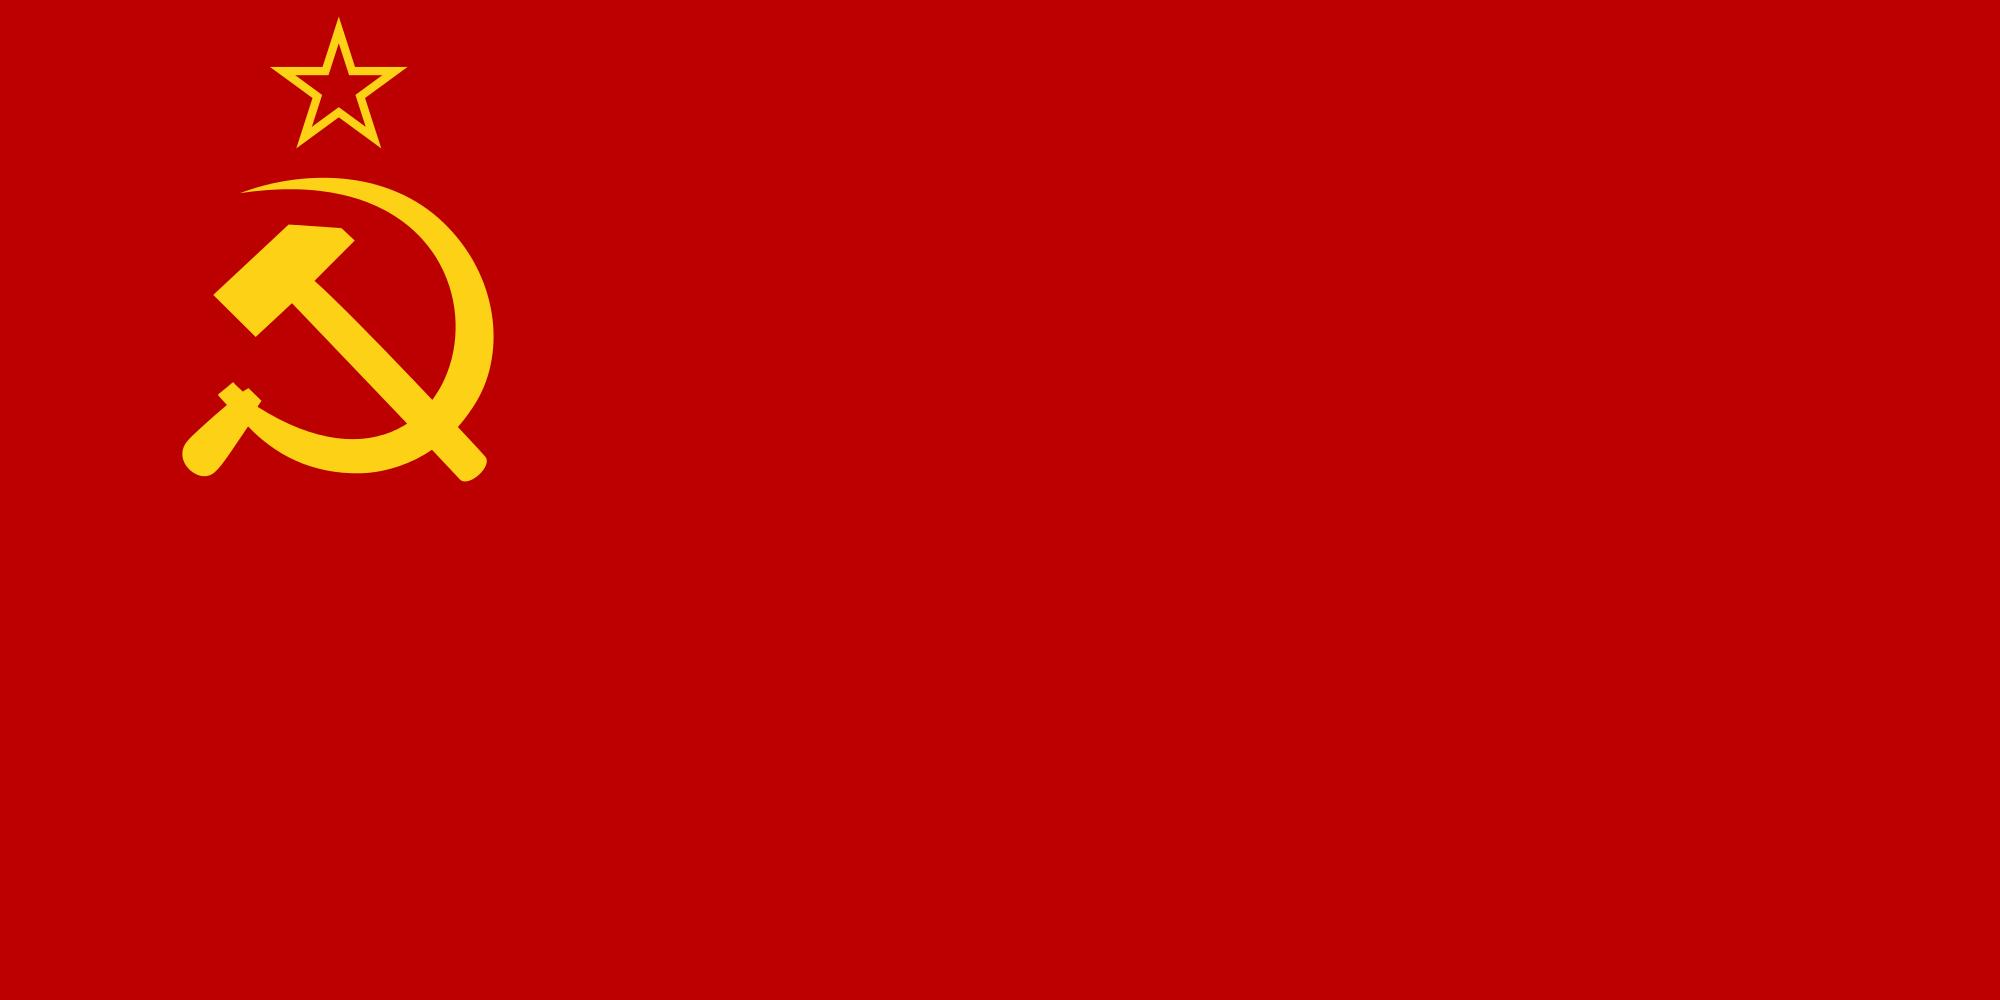 USSR 36-55 HD